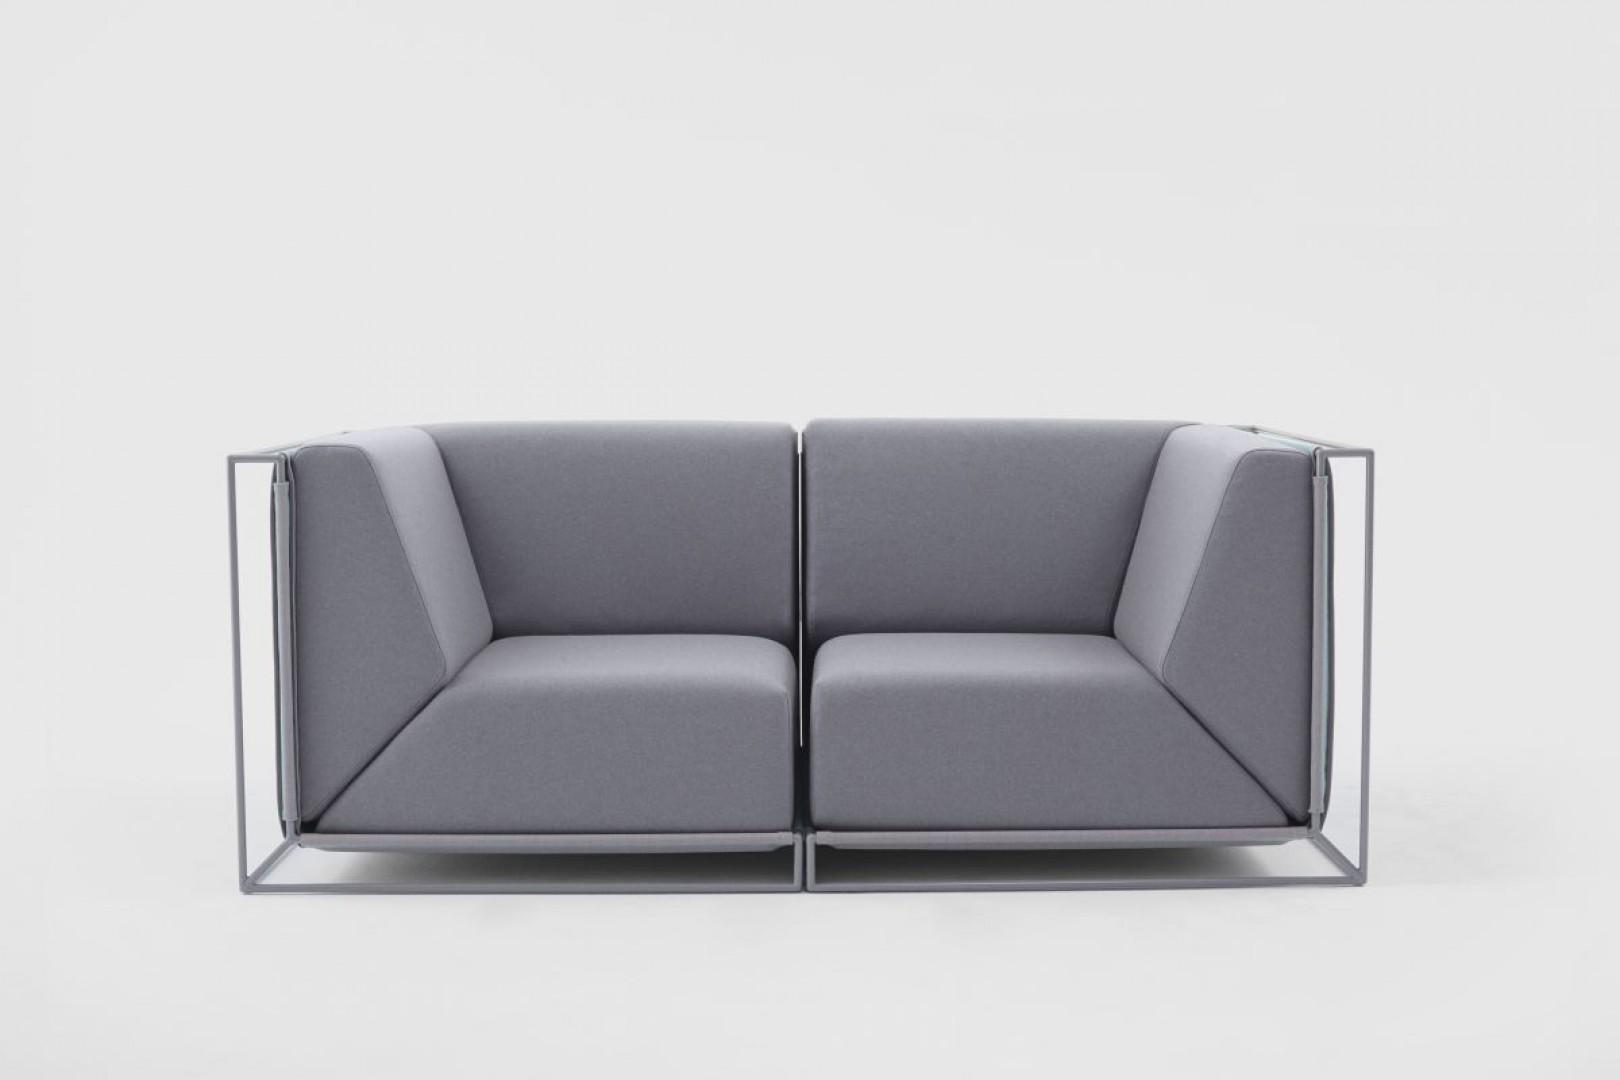 Sofa Floating firmy Comforty. Fot. Ernest Winczyk/Comforty